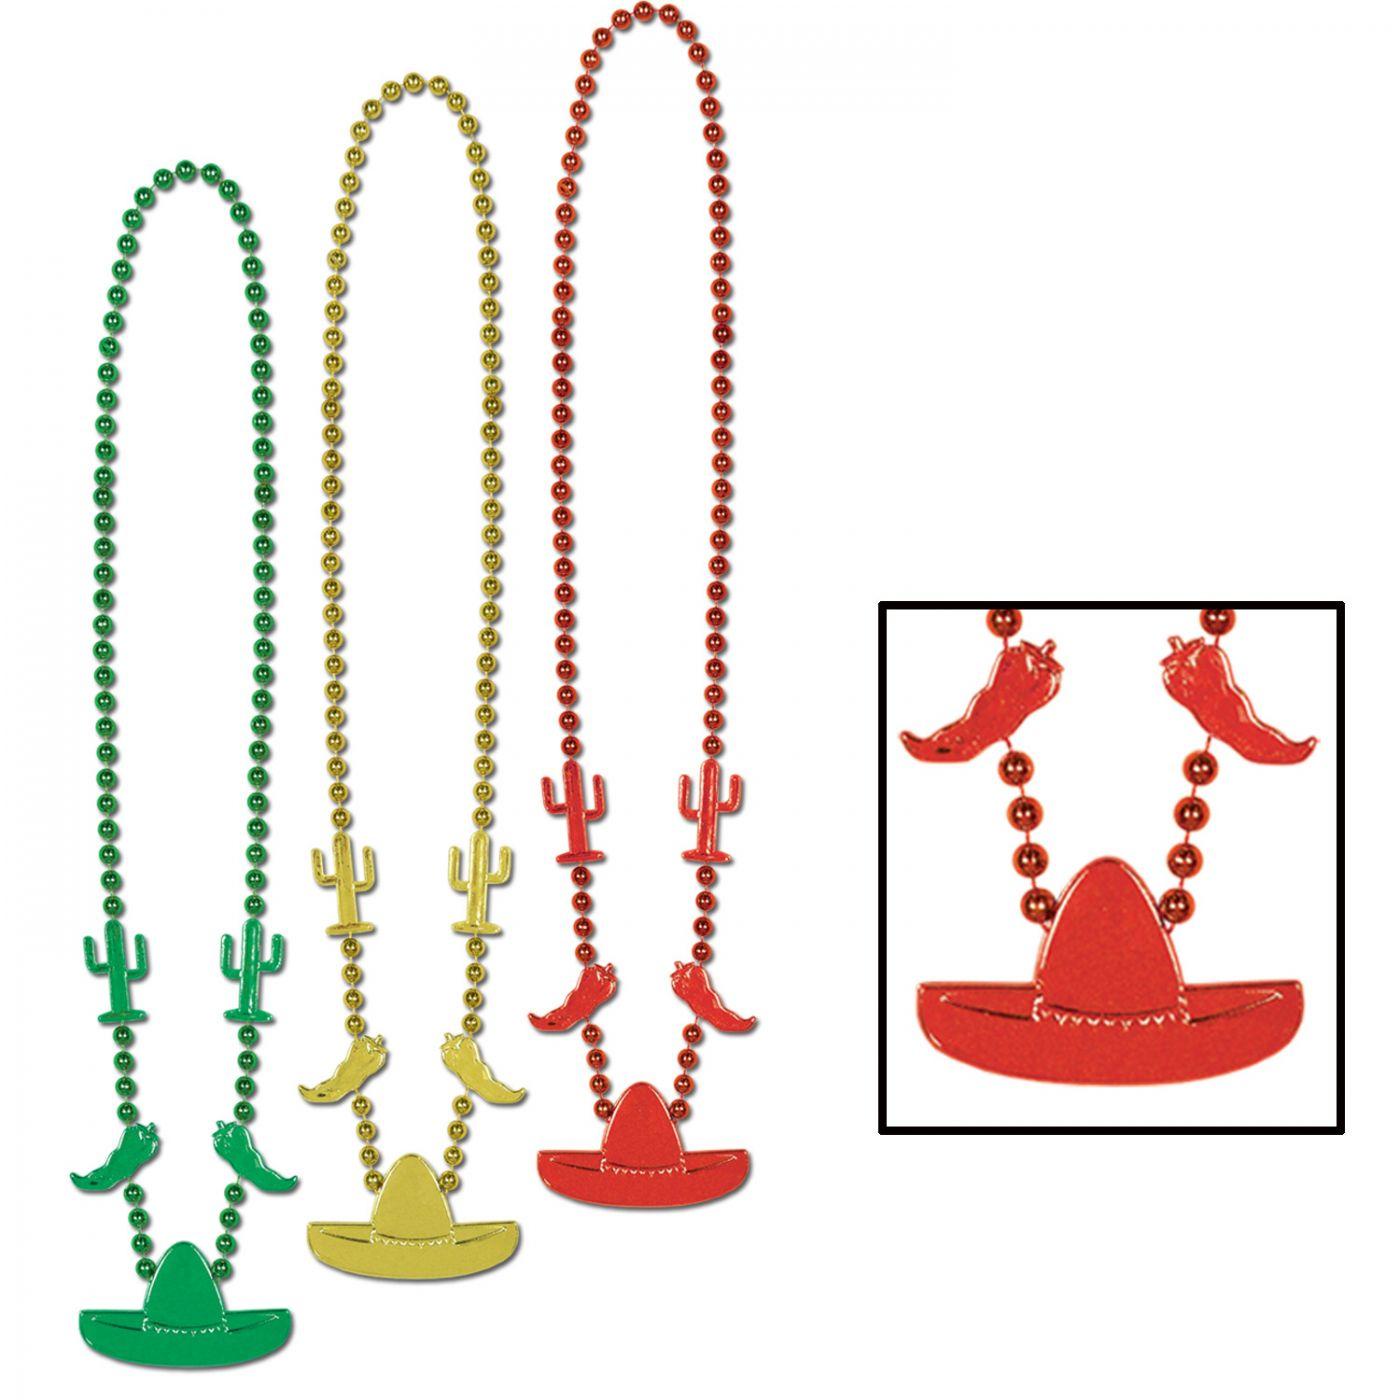 Fiesta Beads image